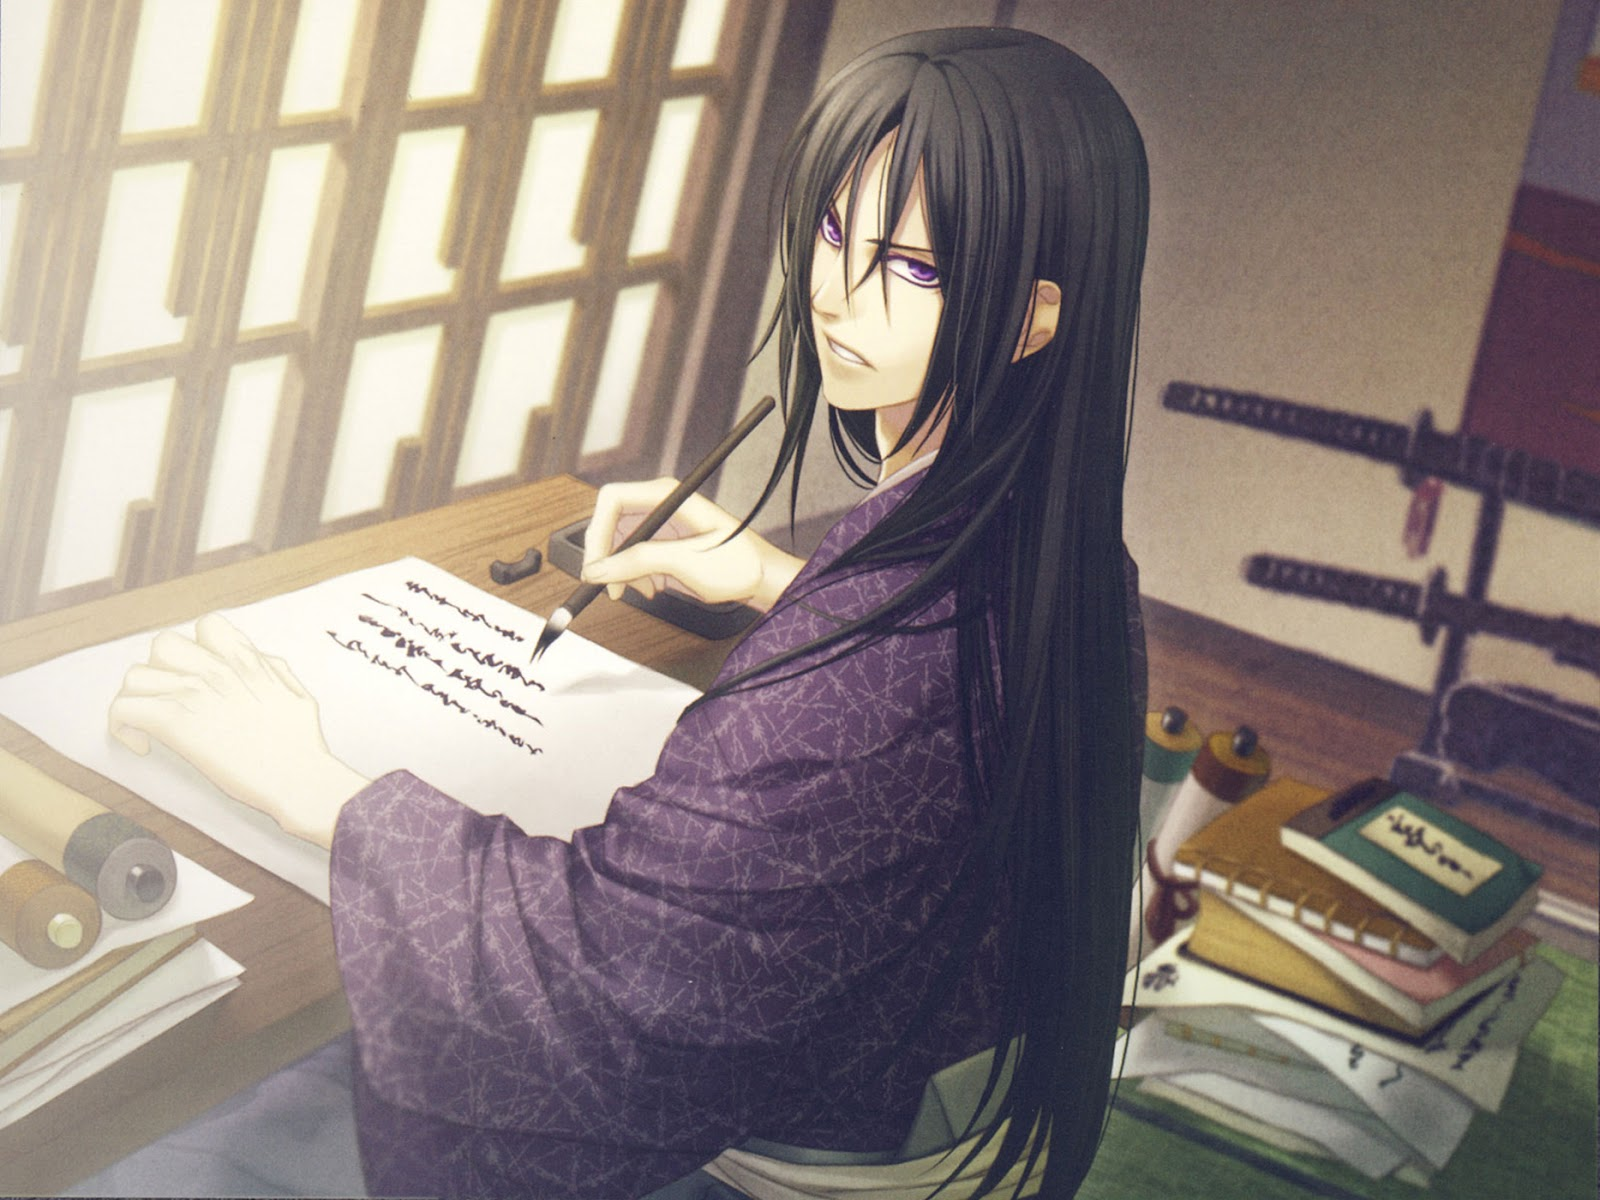 Akito Okita Porn ot/ - /otogen/ - otome gaming general